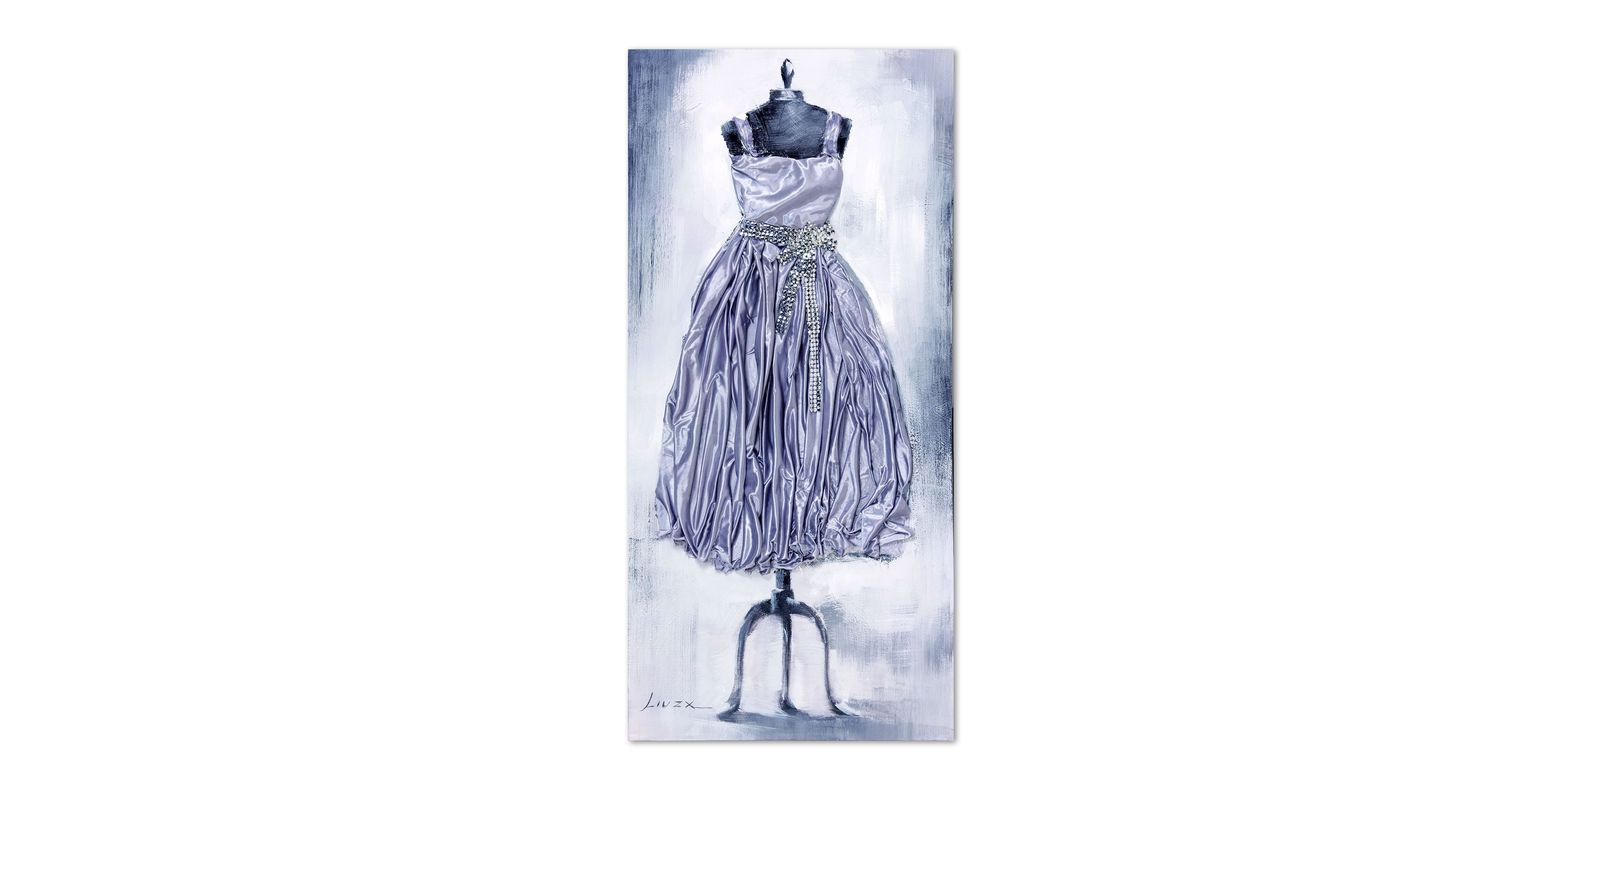 Wandbild Dress grau mit glänzendem Stoff